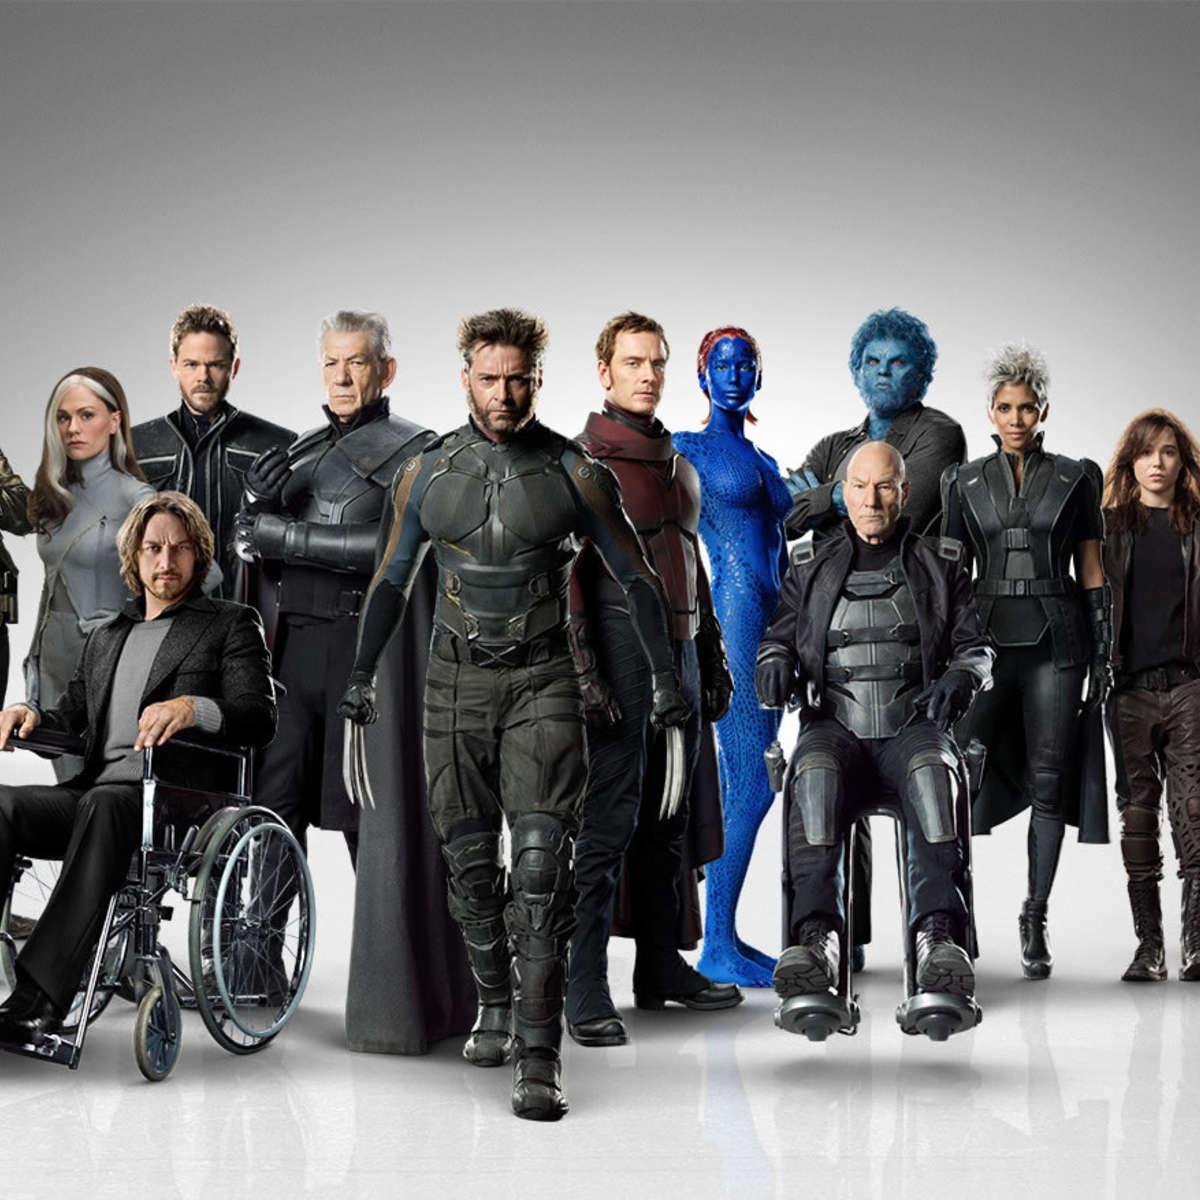 X-men-days-of-future-past-cast.jpg